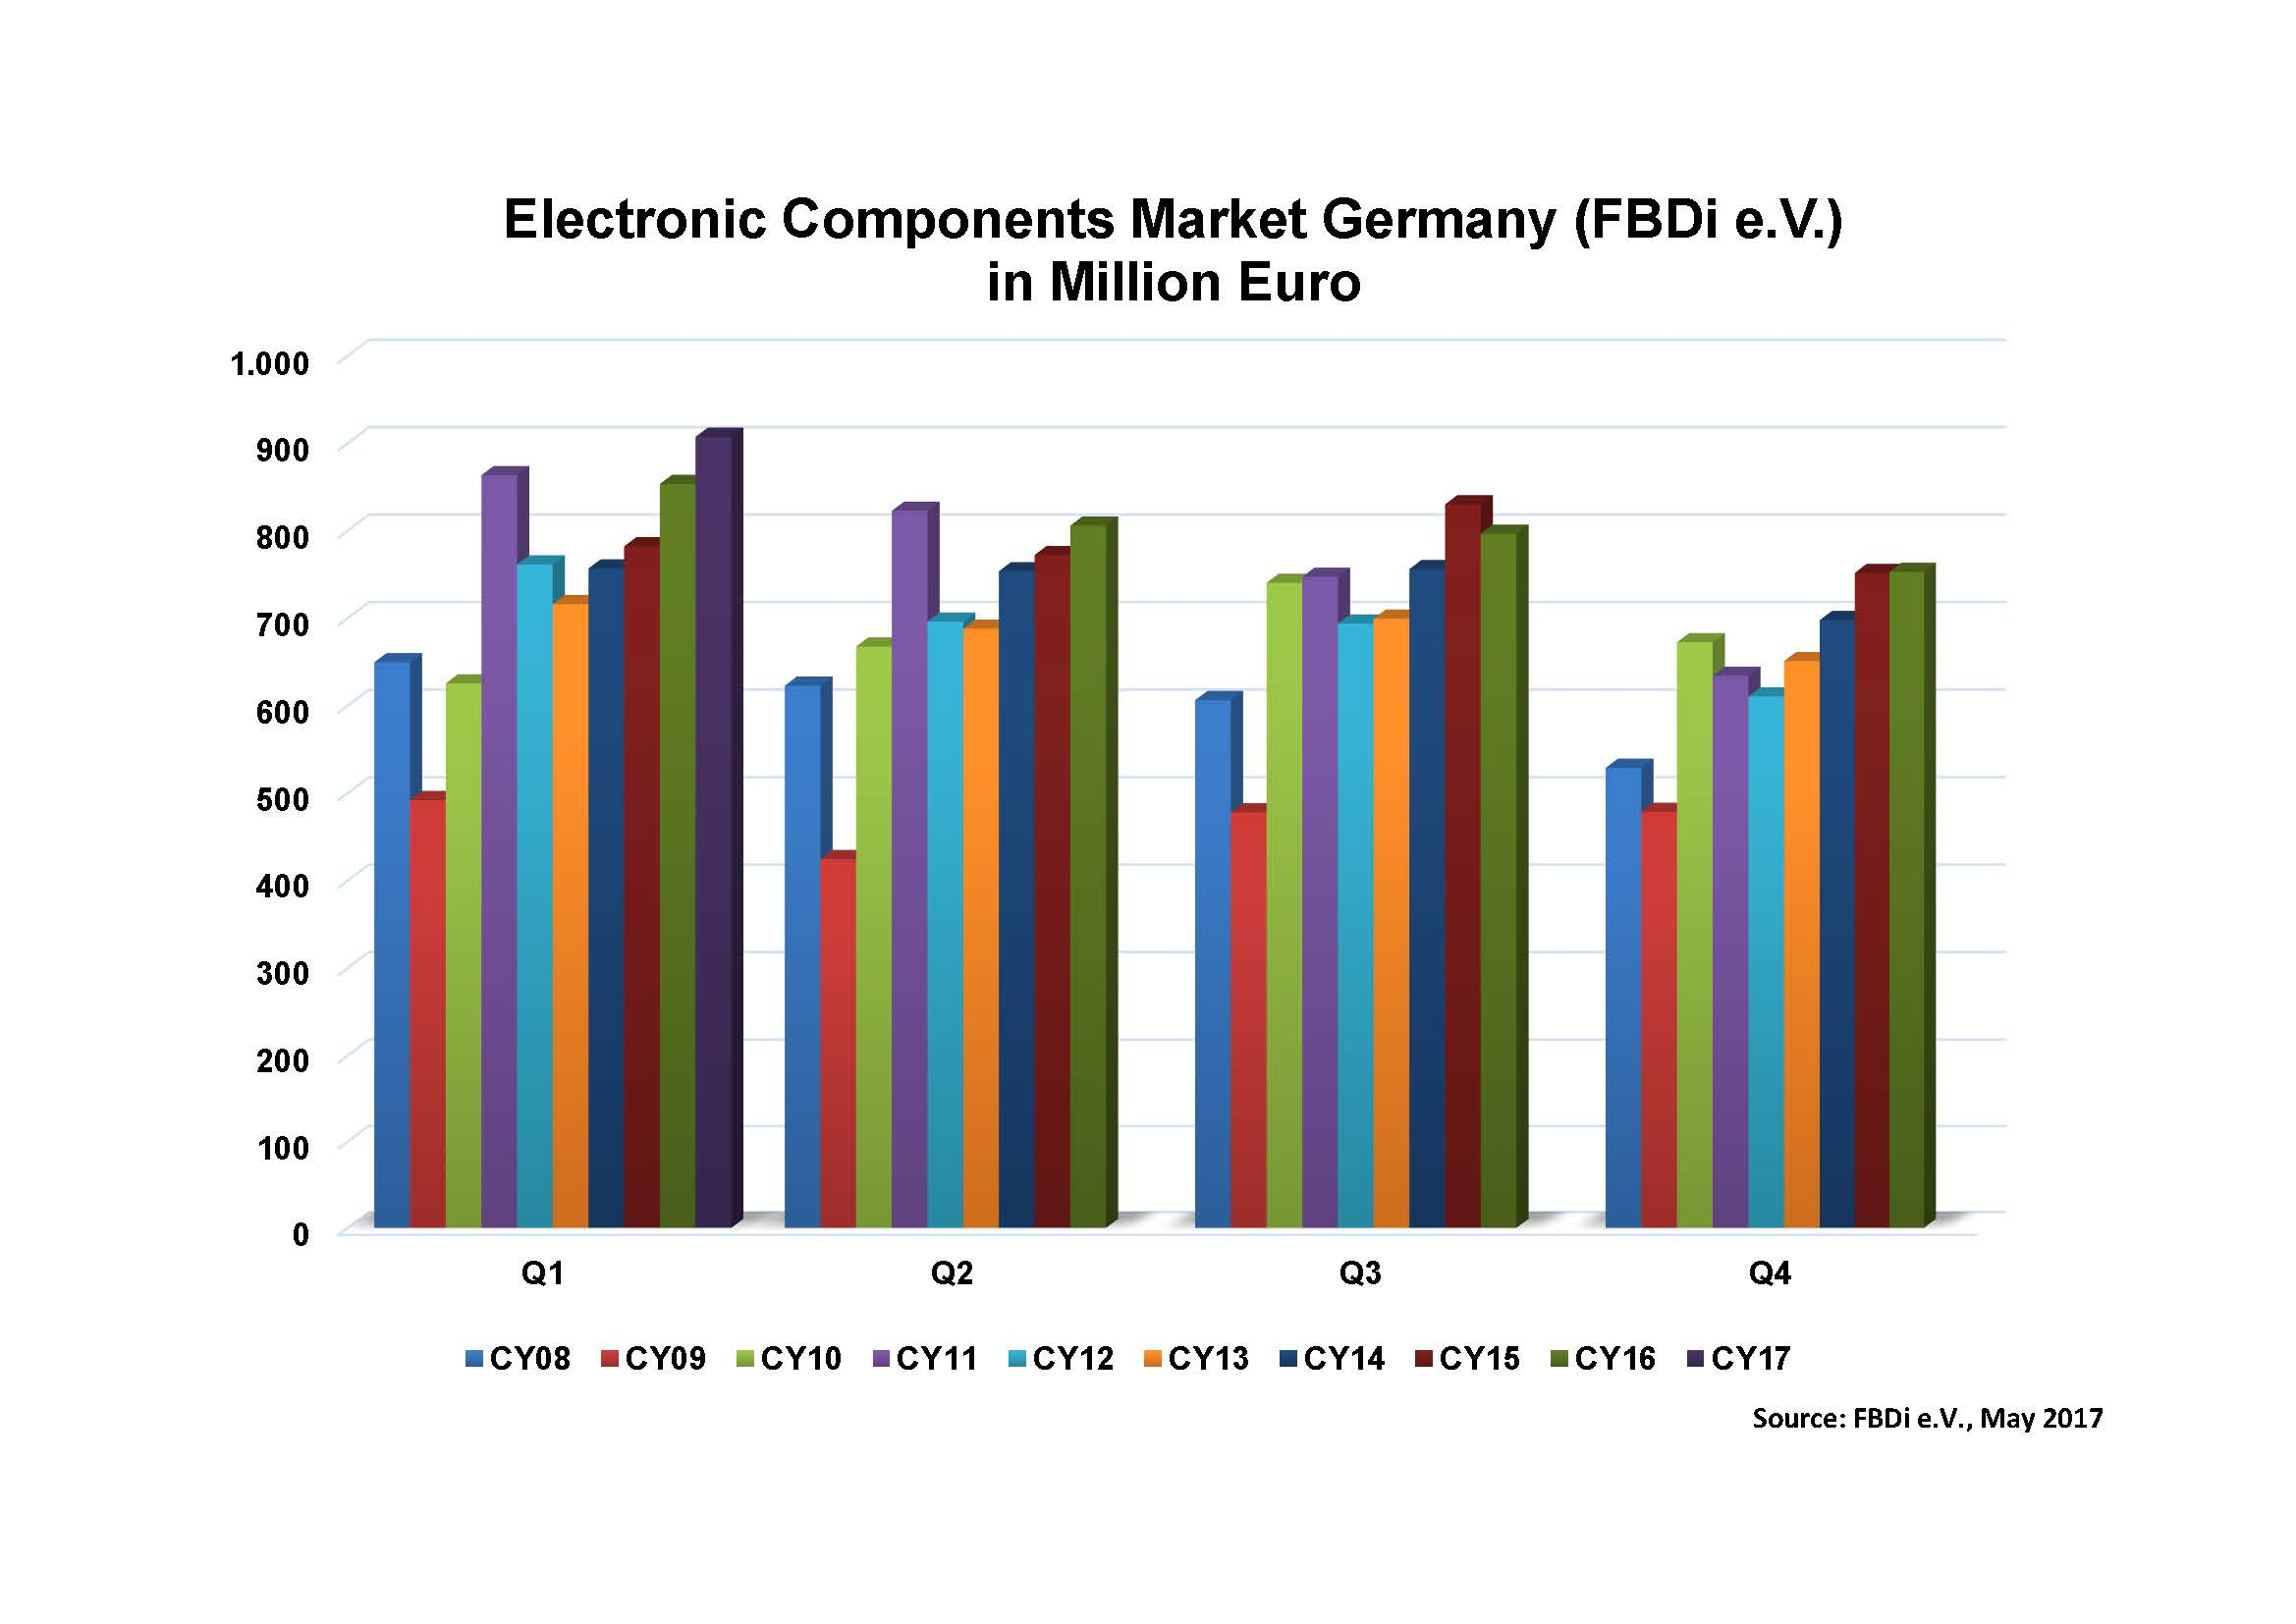 German distributors are having a good 2017